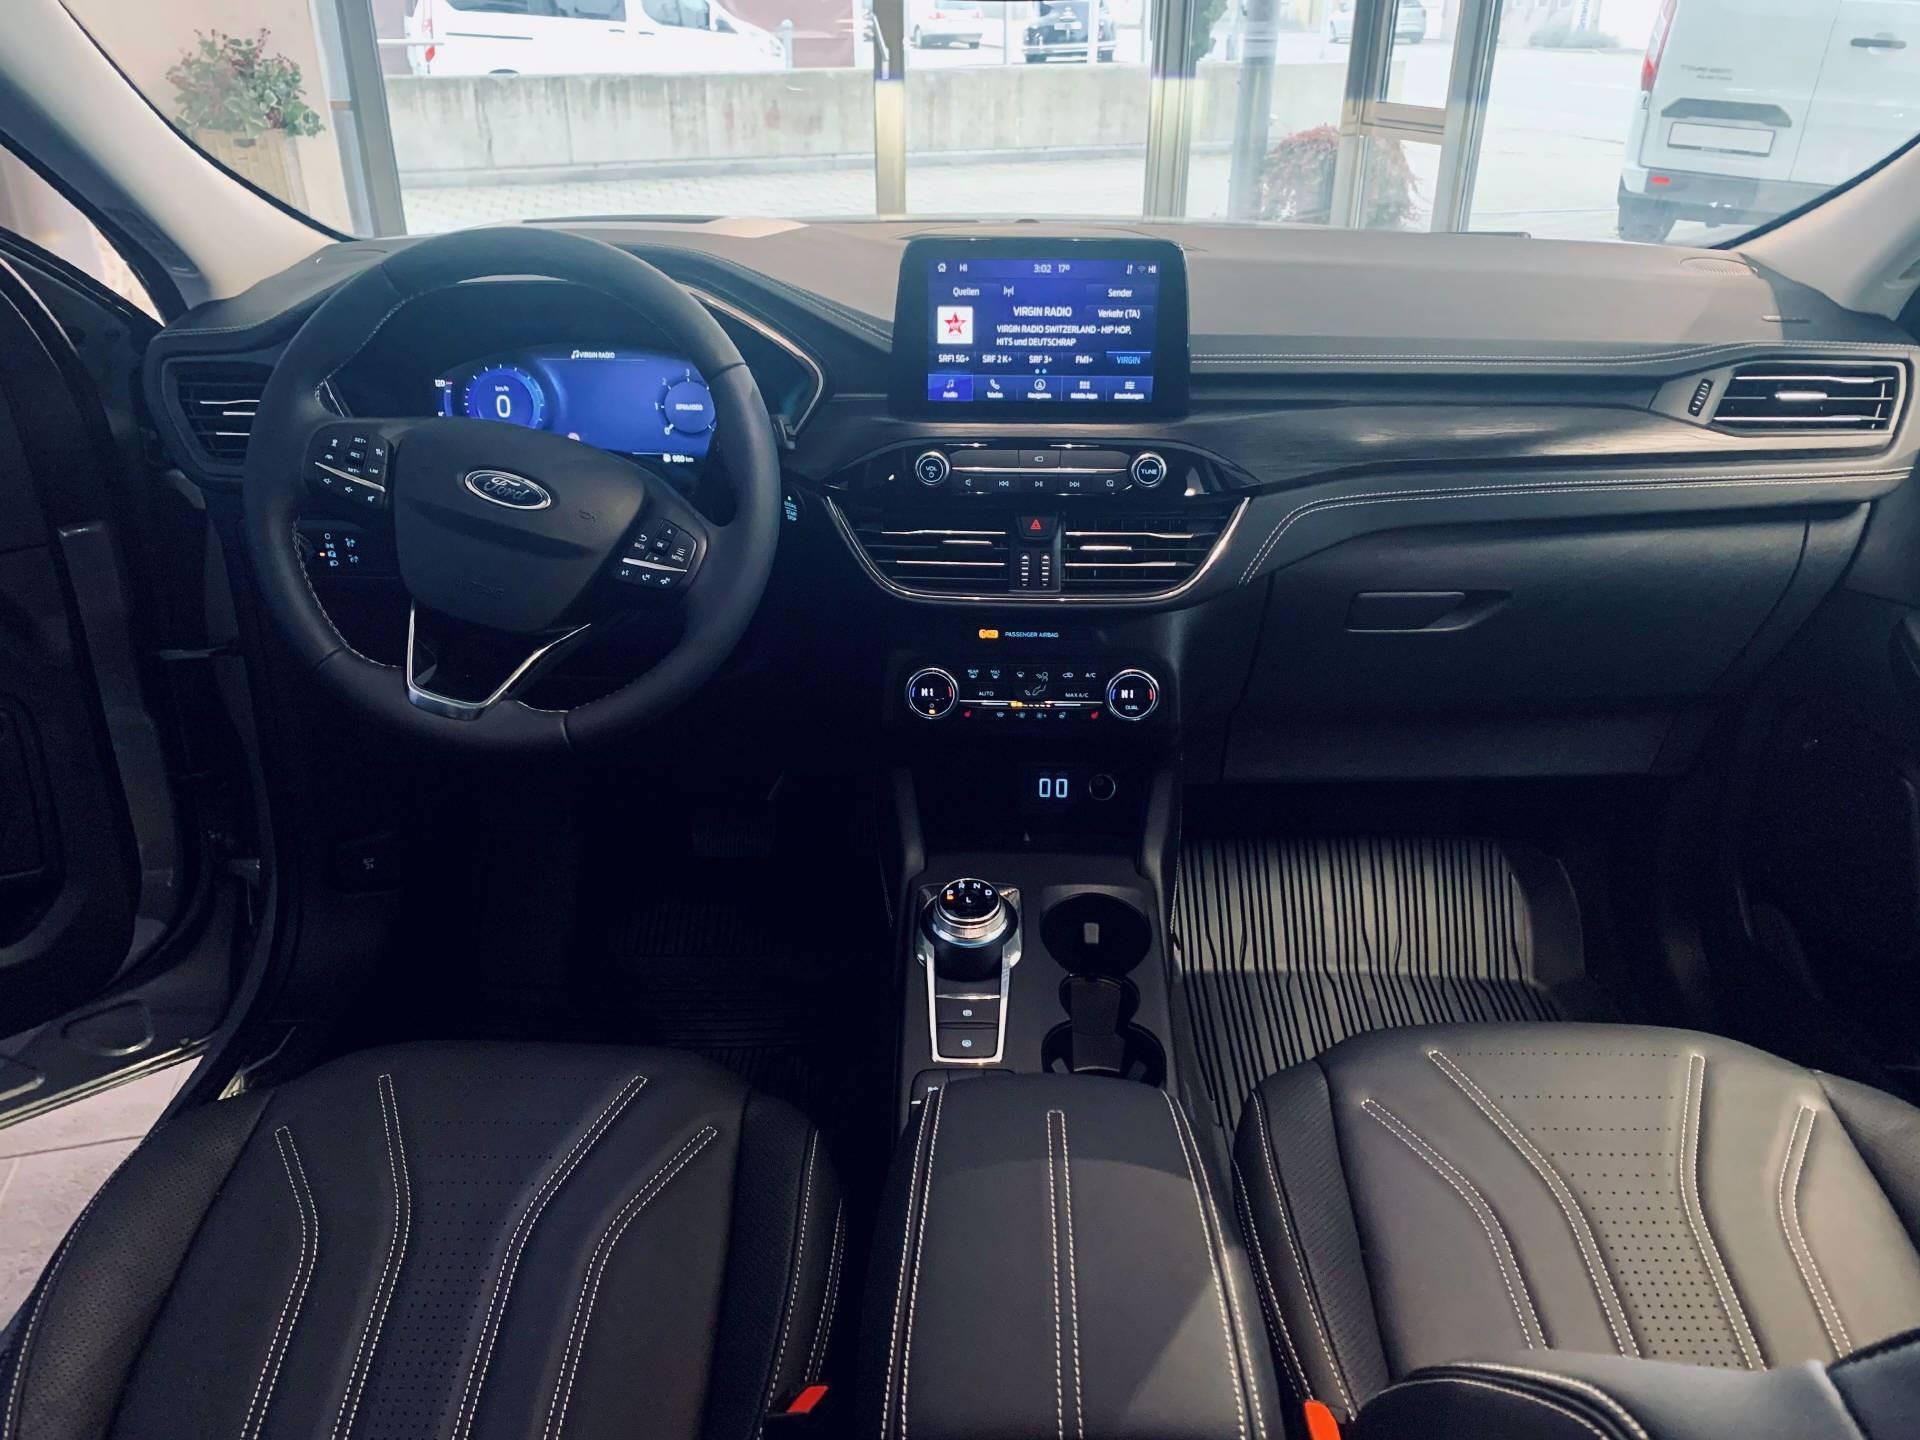 2020 Ford Kuga 2.0 EcoBlue Vignale 4x4